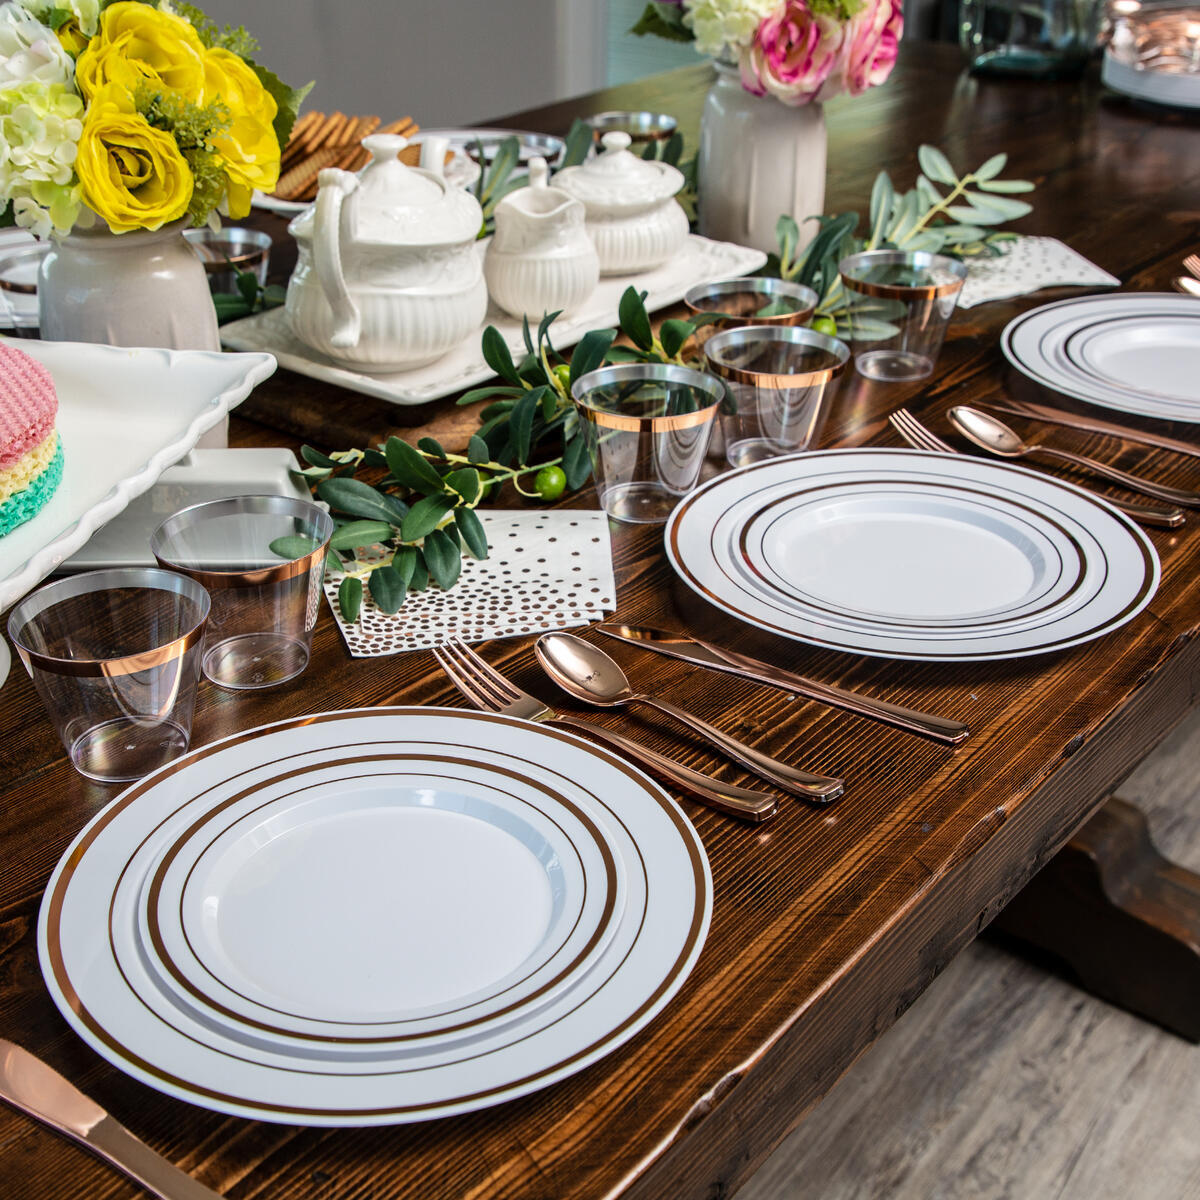 *On SALE* Elegant ROSE GOLD Plastic Disposable Dinner Dessert Plates 110 pcs (eBay)